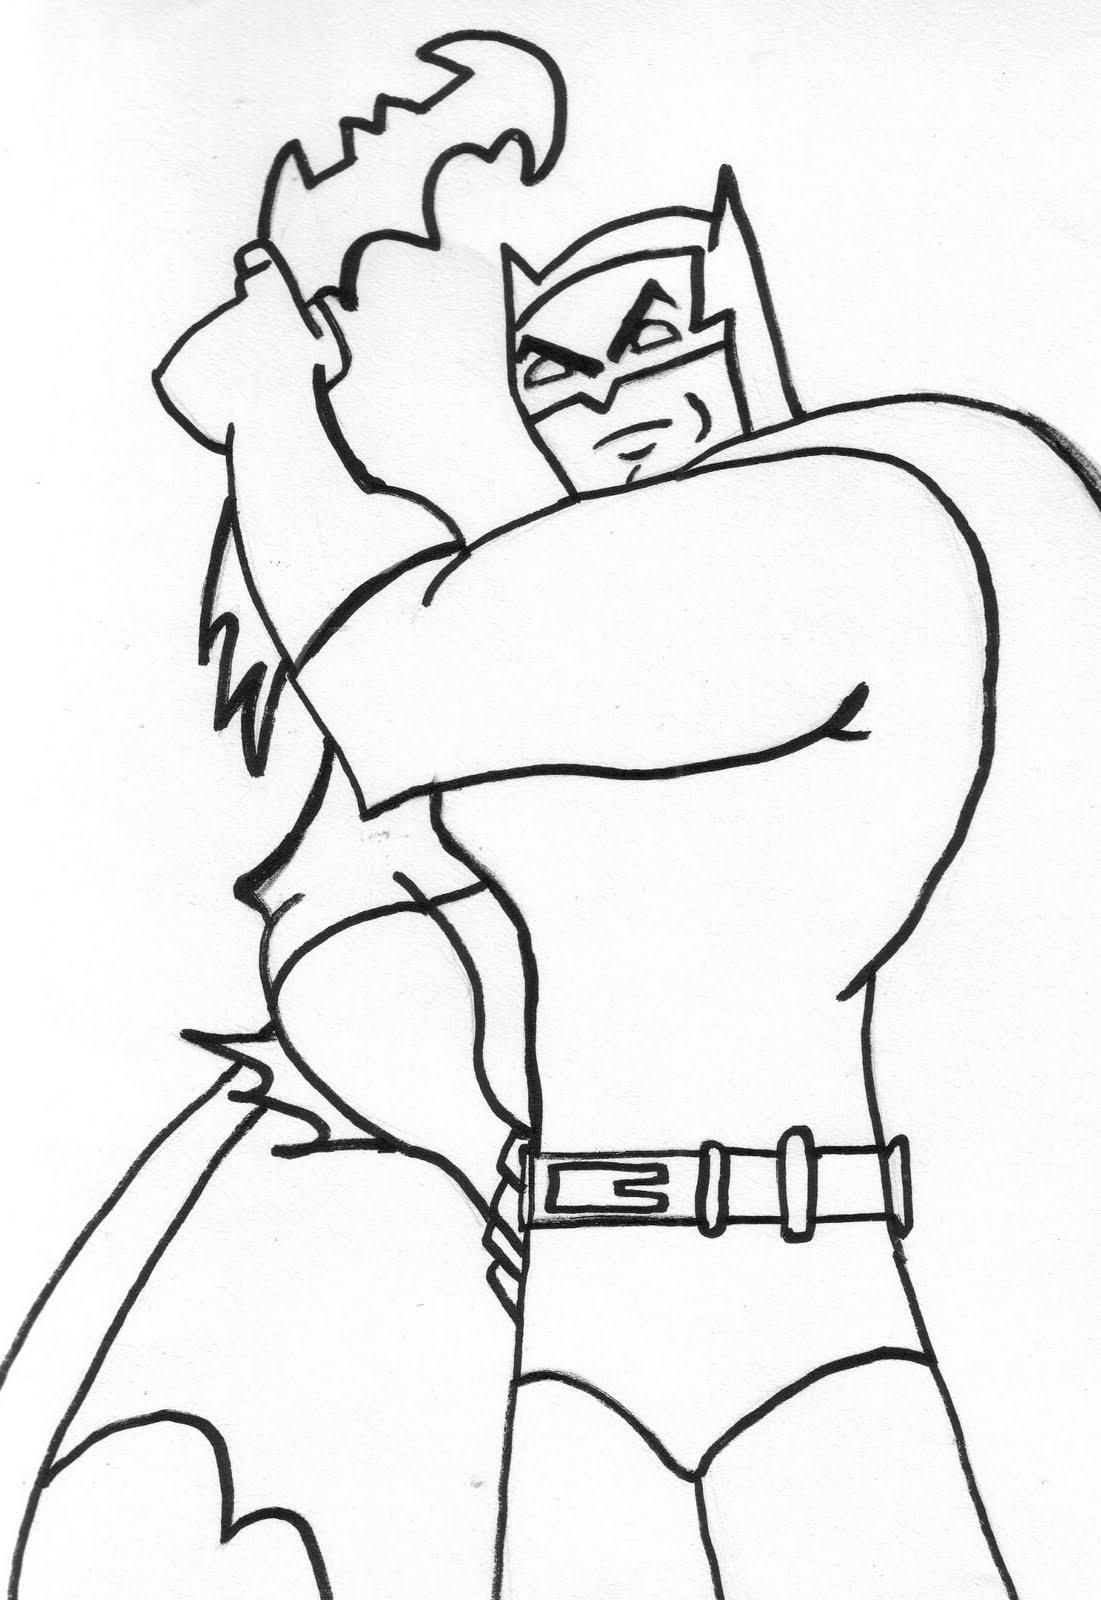 batman and joker coloring pages batman coloring pages pages coloring joker and batman